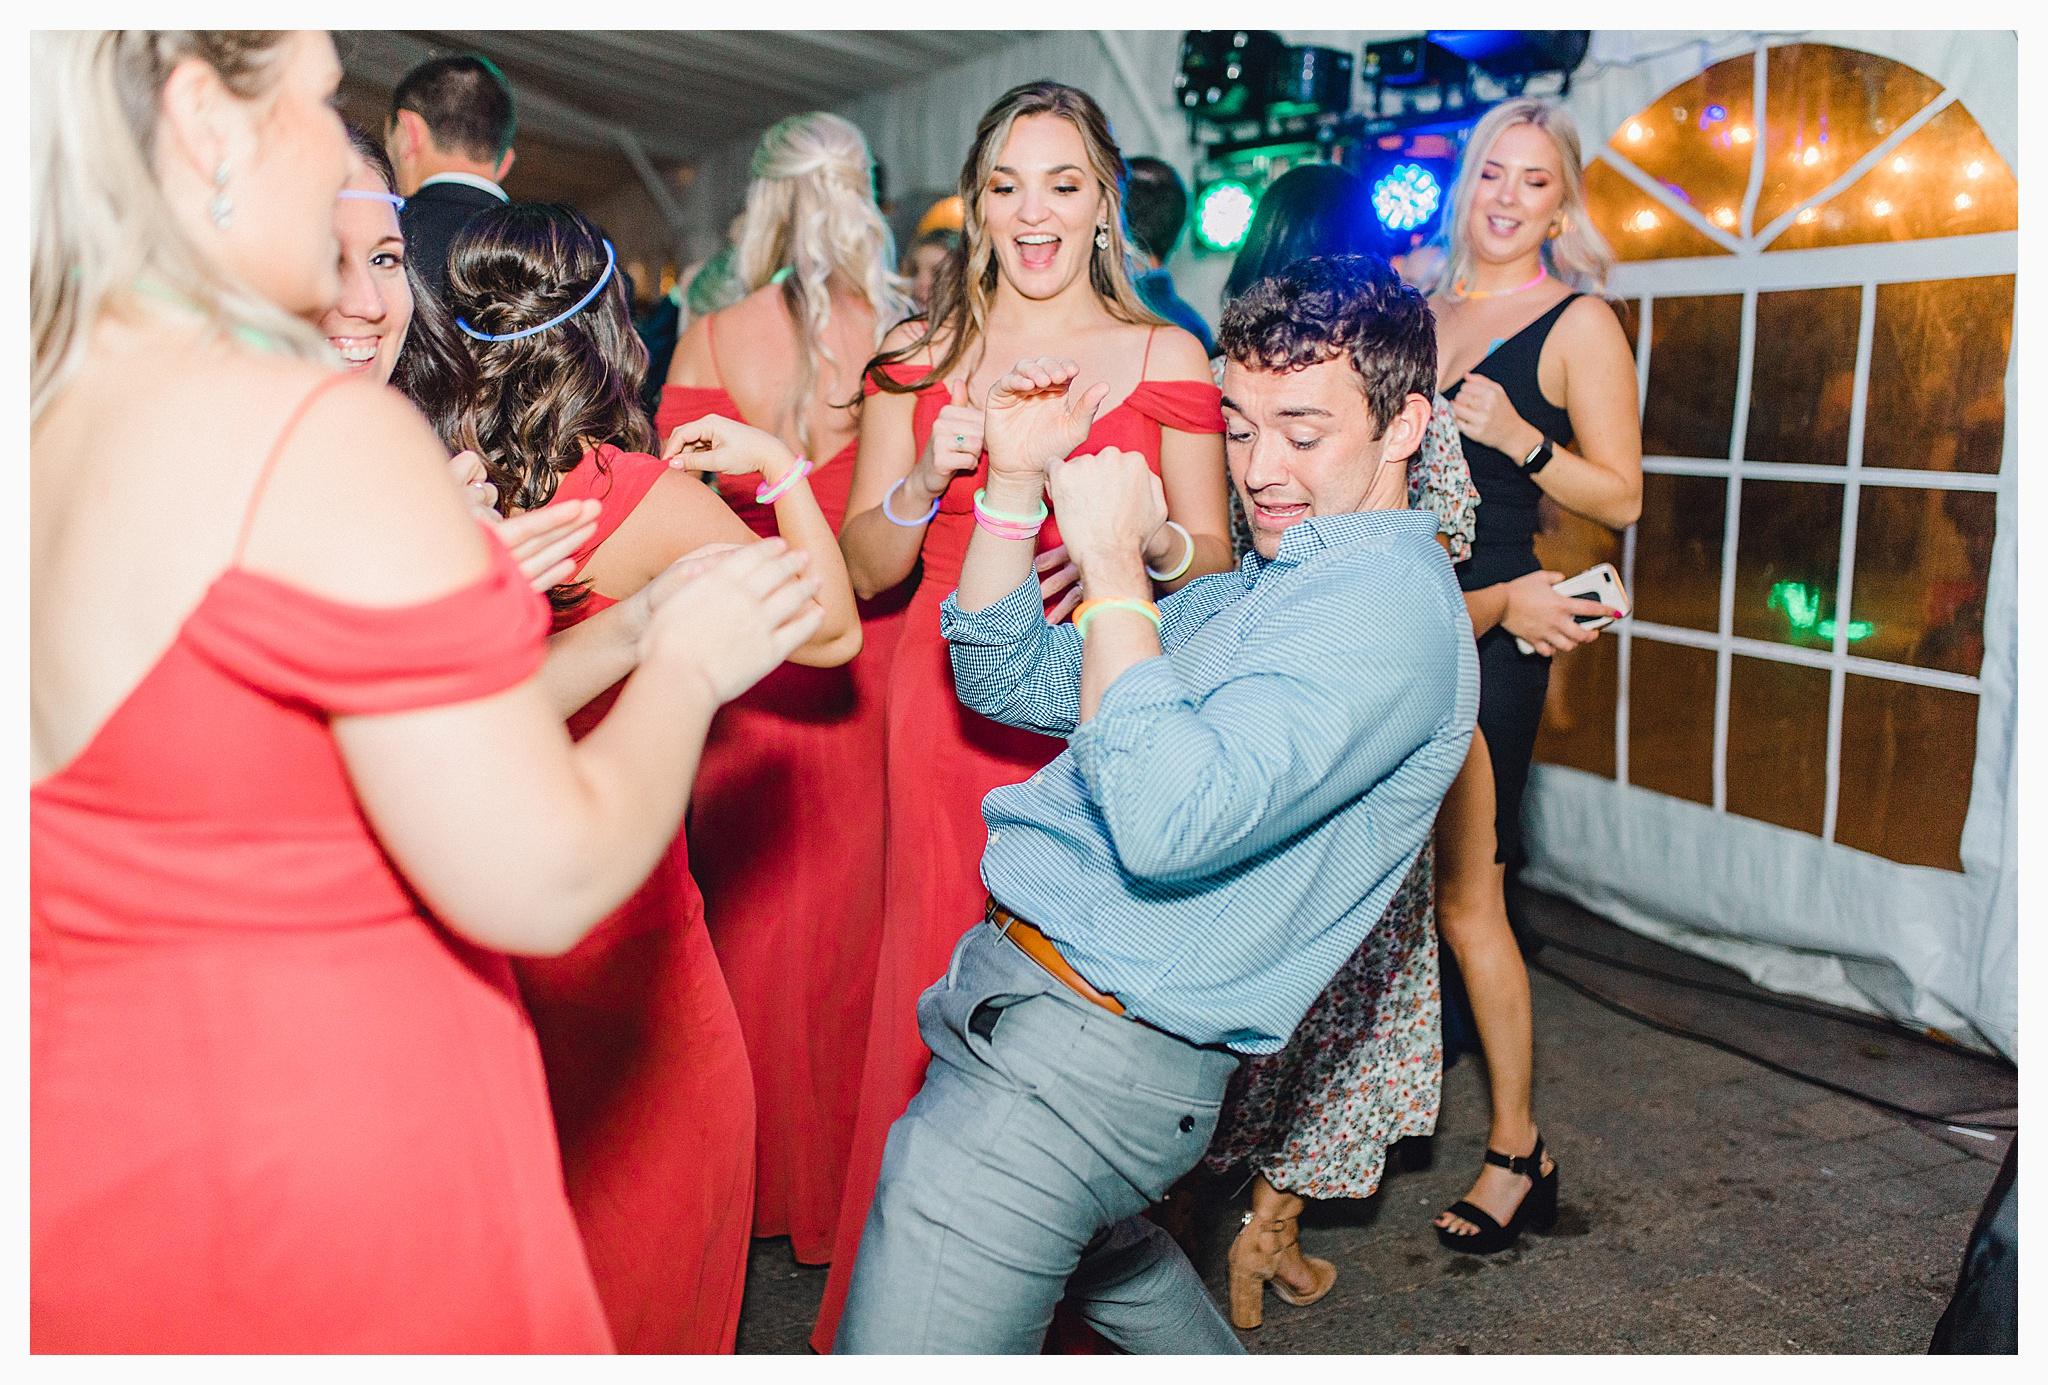 Emma Rose Company Light and Airy Wedding Photographer, Beautiful fall wedding at Rock Creek Gardens Venue in Puyallup, Washington._0117.jpg